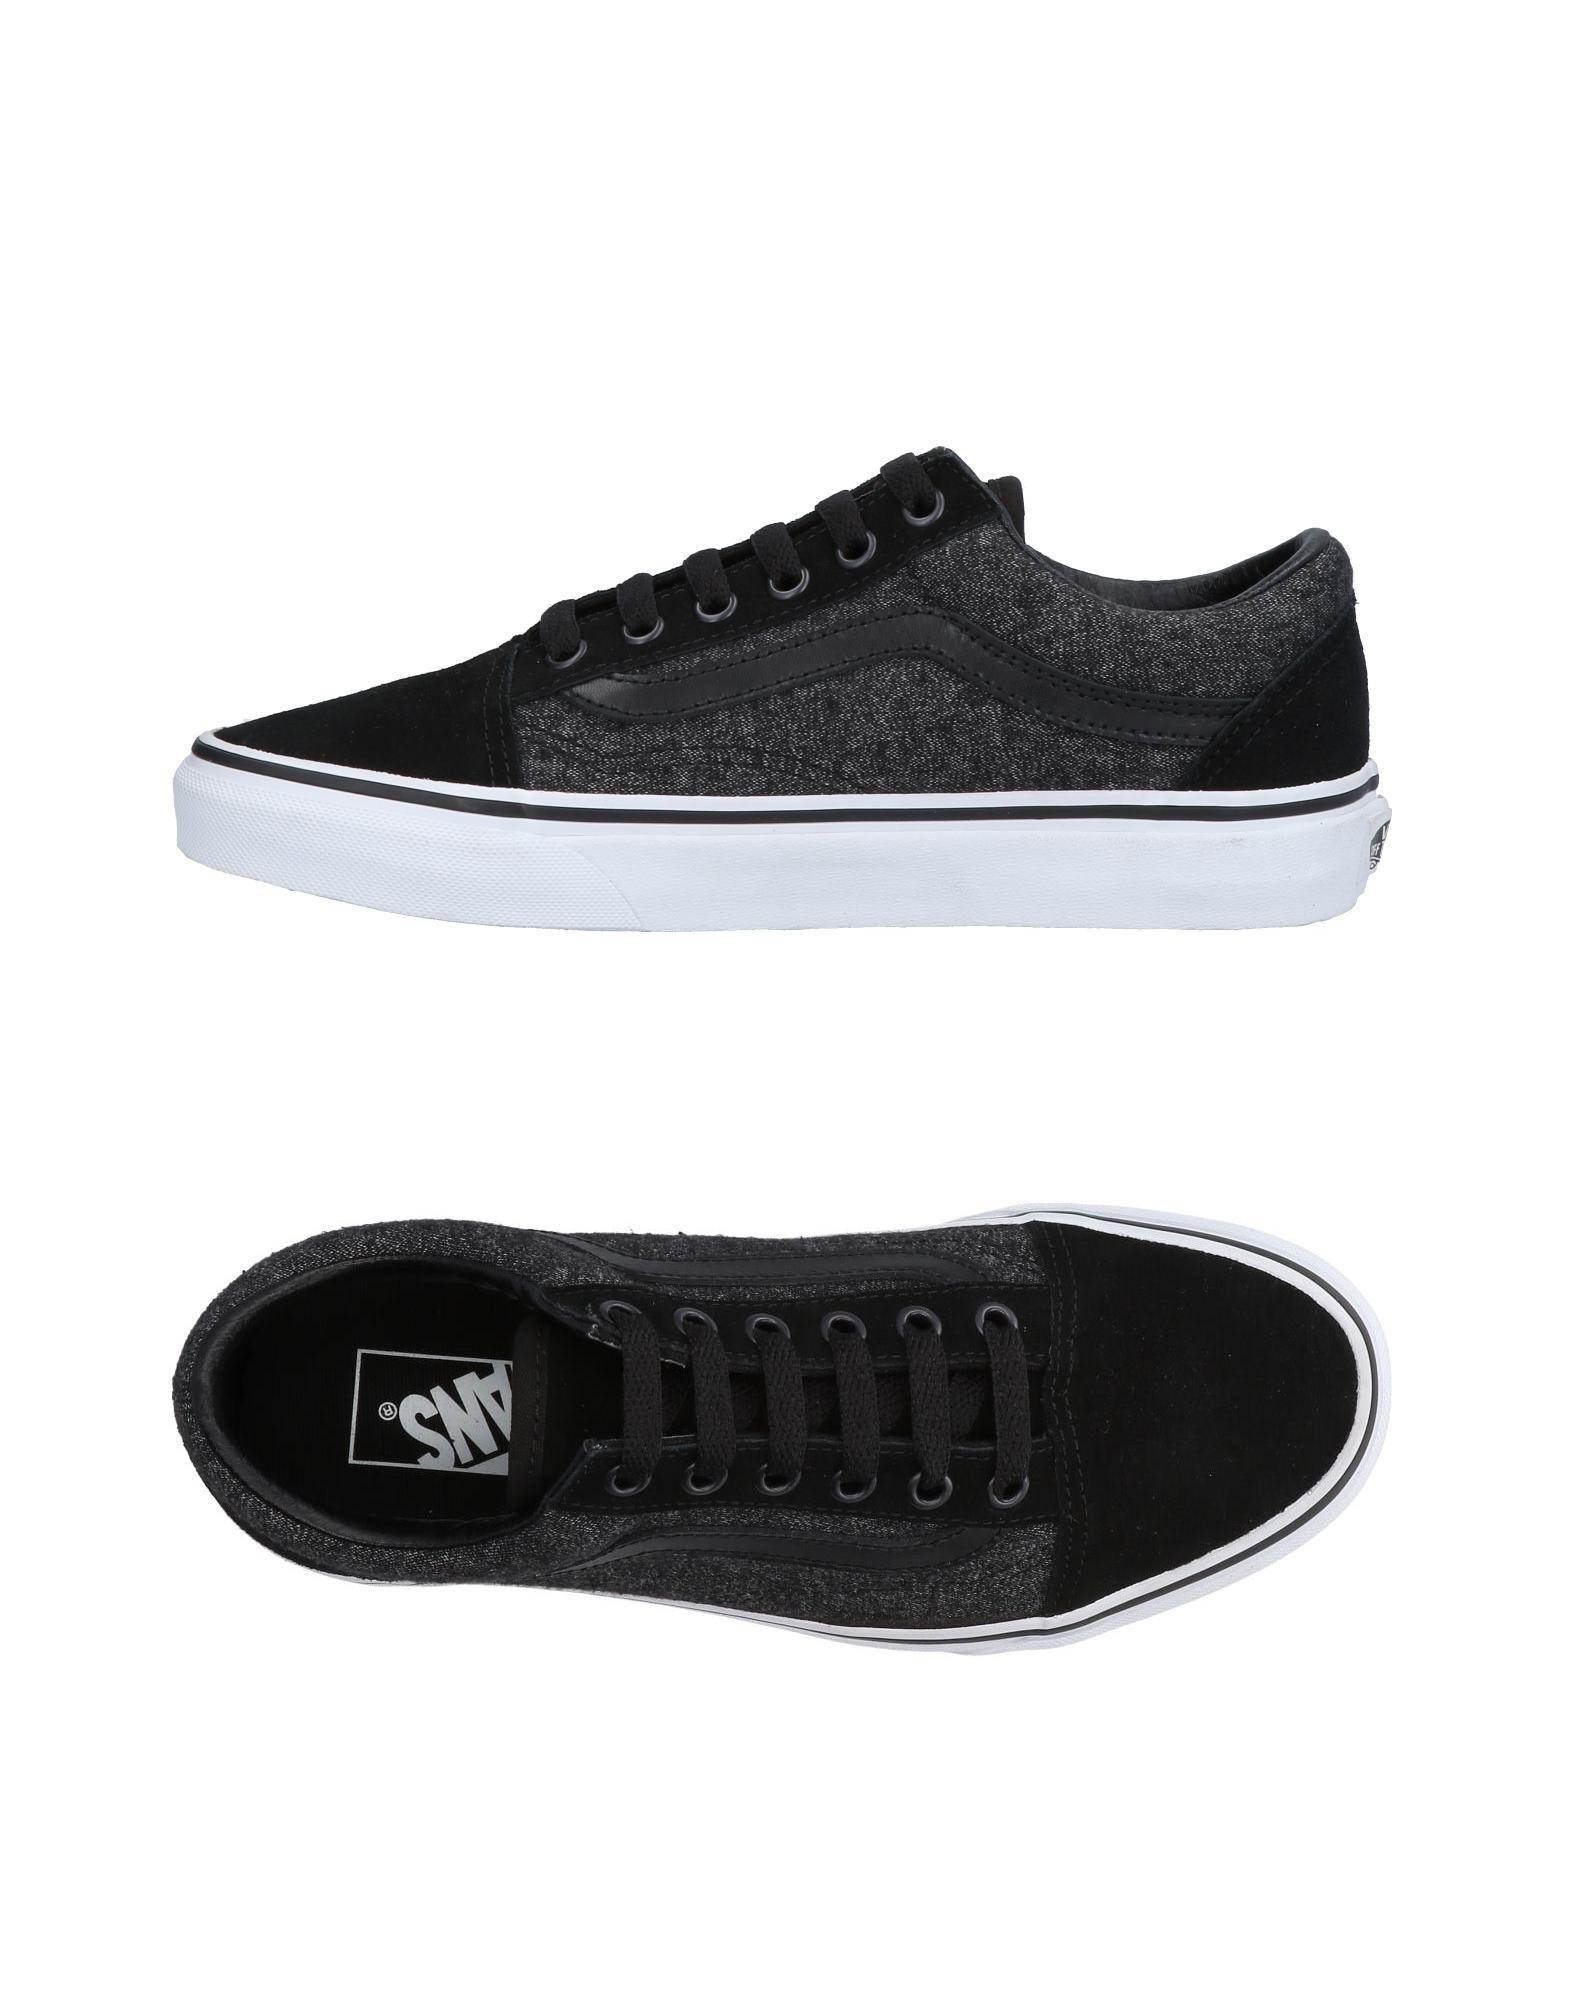 Sneakers Vans Scarpe Donna - 11476091UE Scarpe Vans comode e distintive e1cf4c